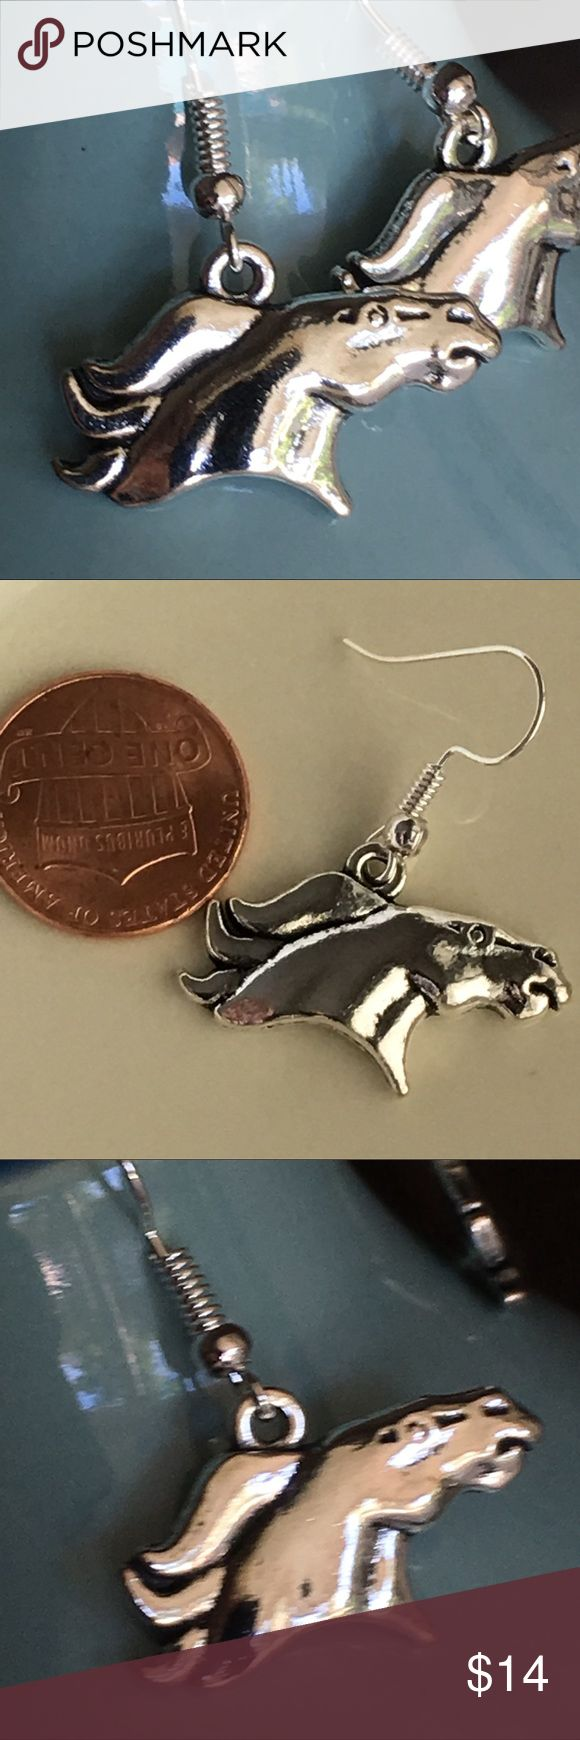 Bronco horse 🐴 earrings Broncos horse 🐴 heads on silver ear wires. Jewelry Earrings